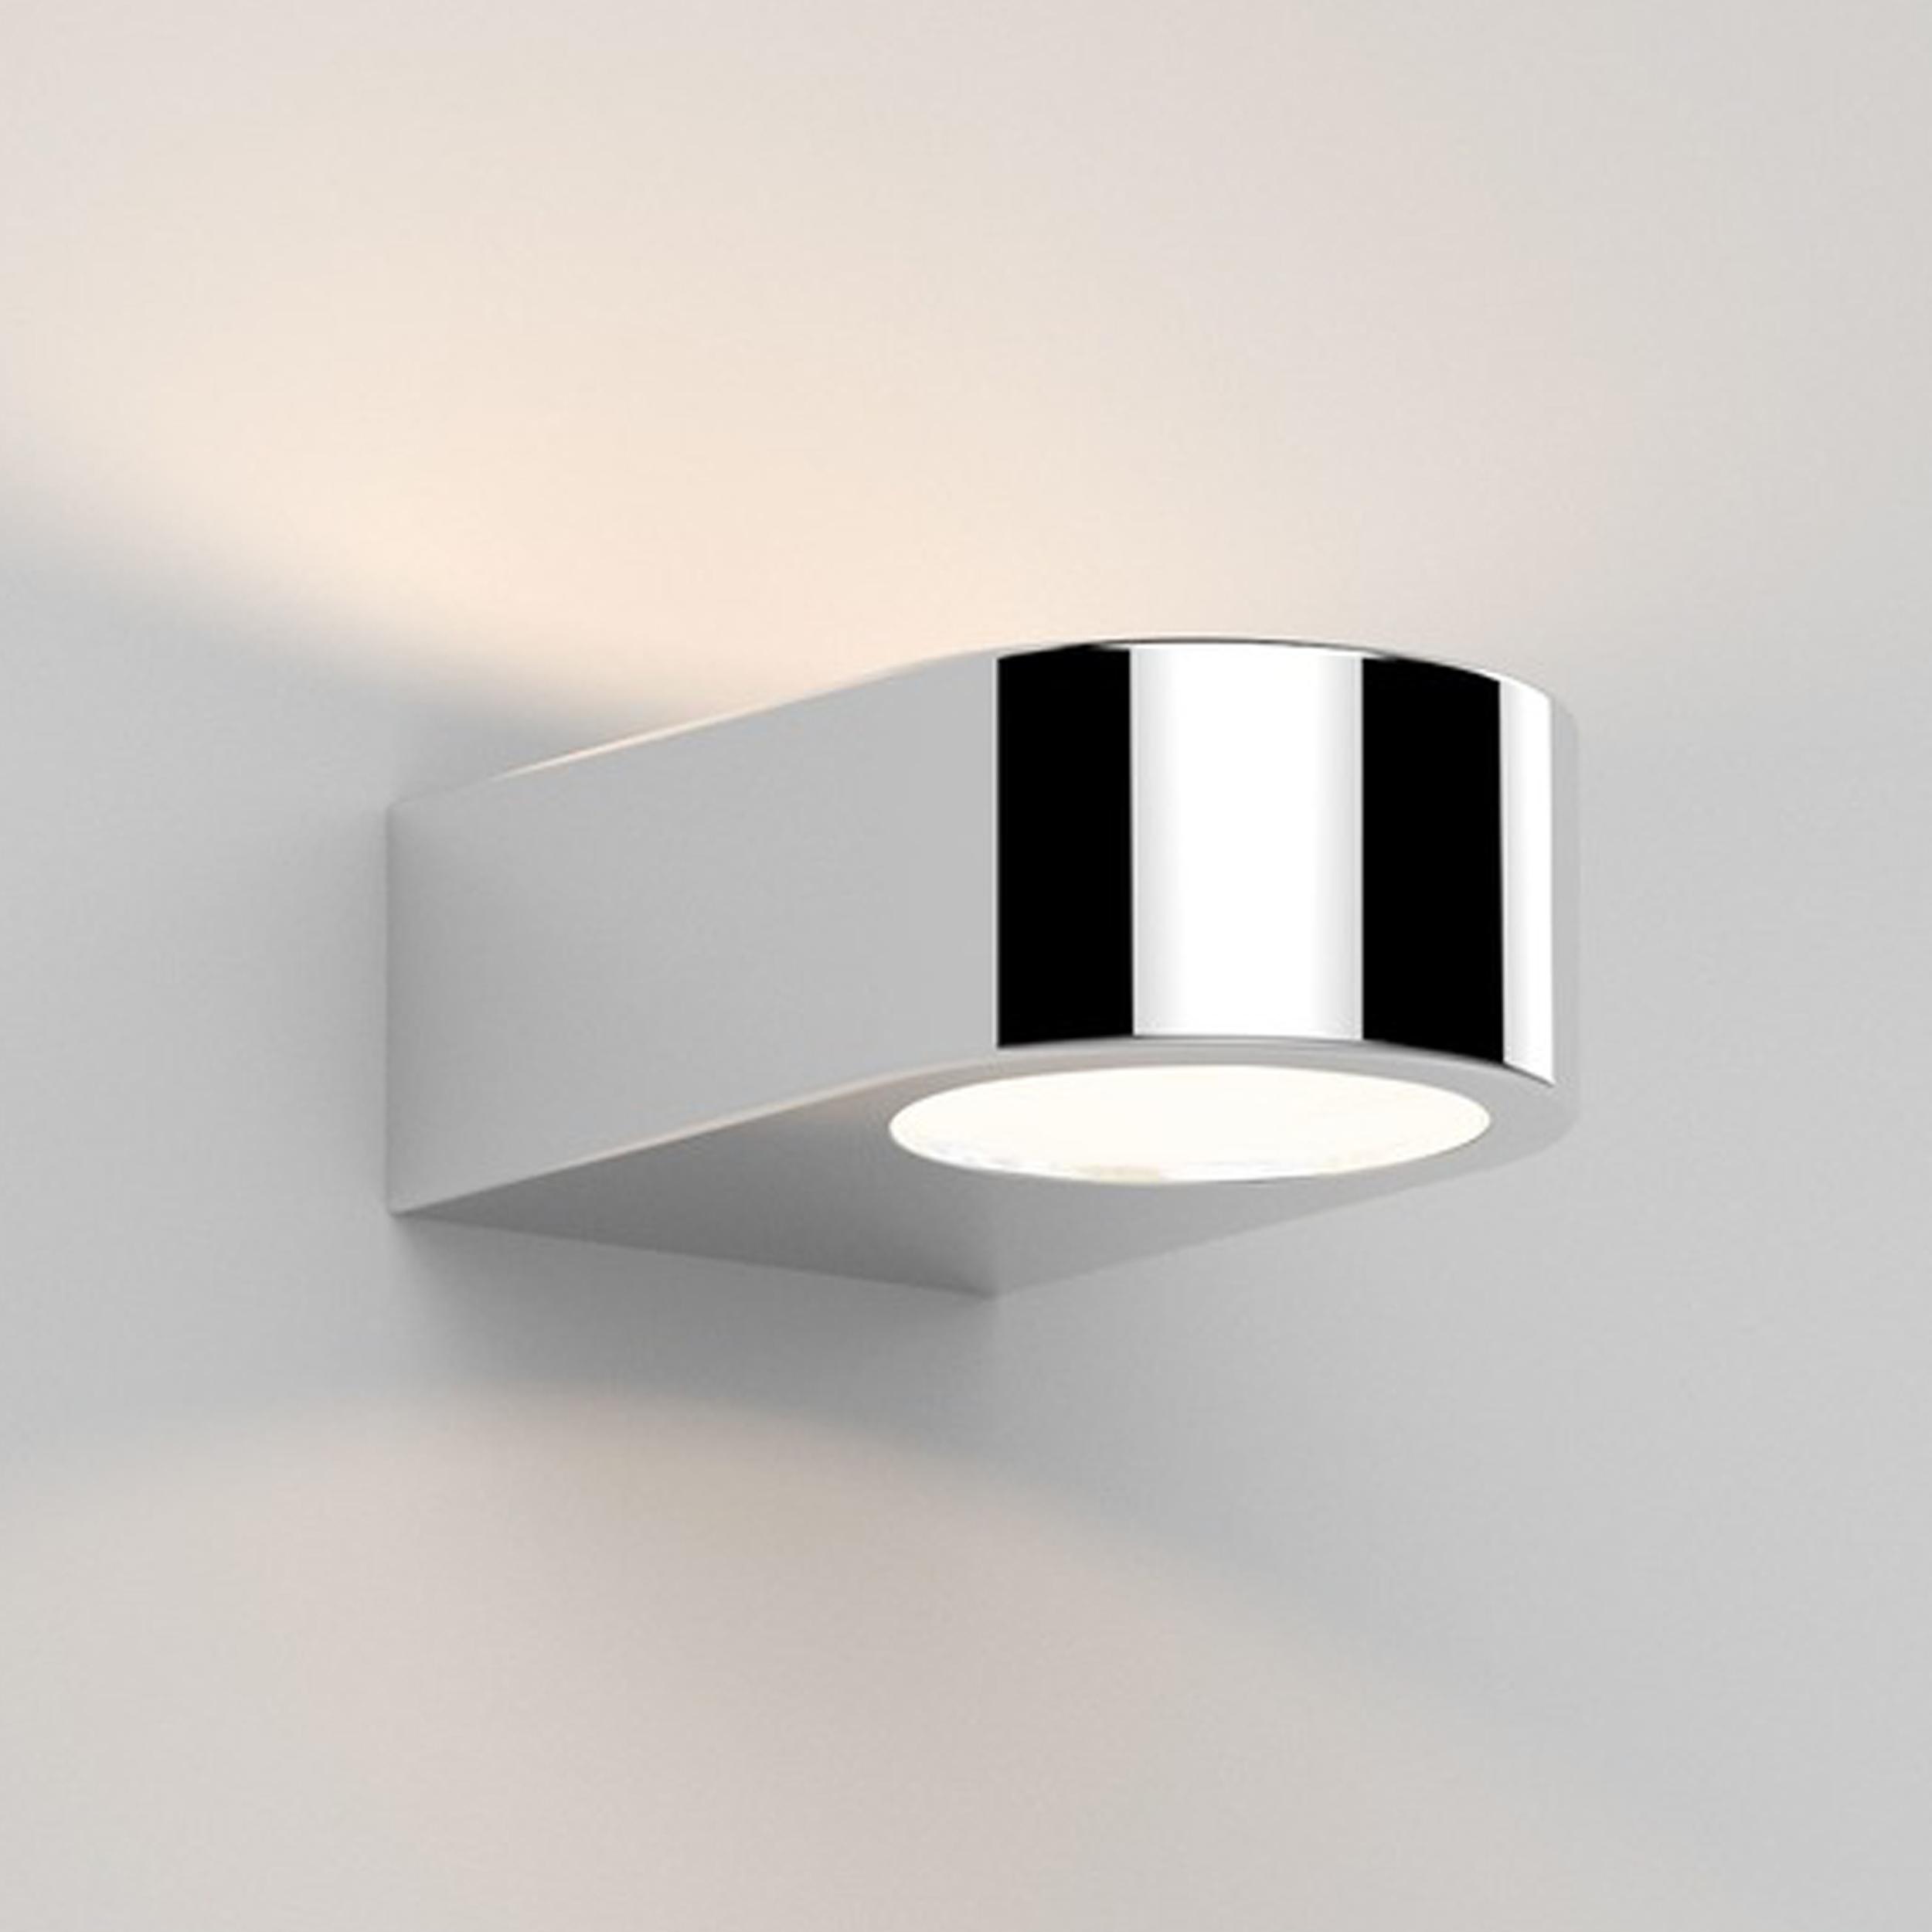 Astro Epsilon Led Wall Light Polished Chrome